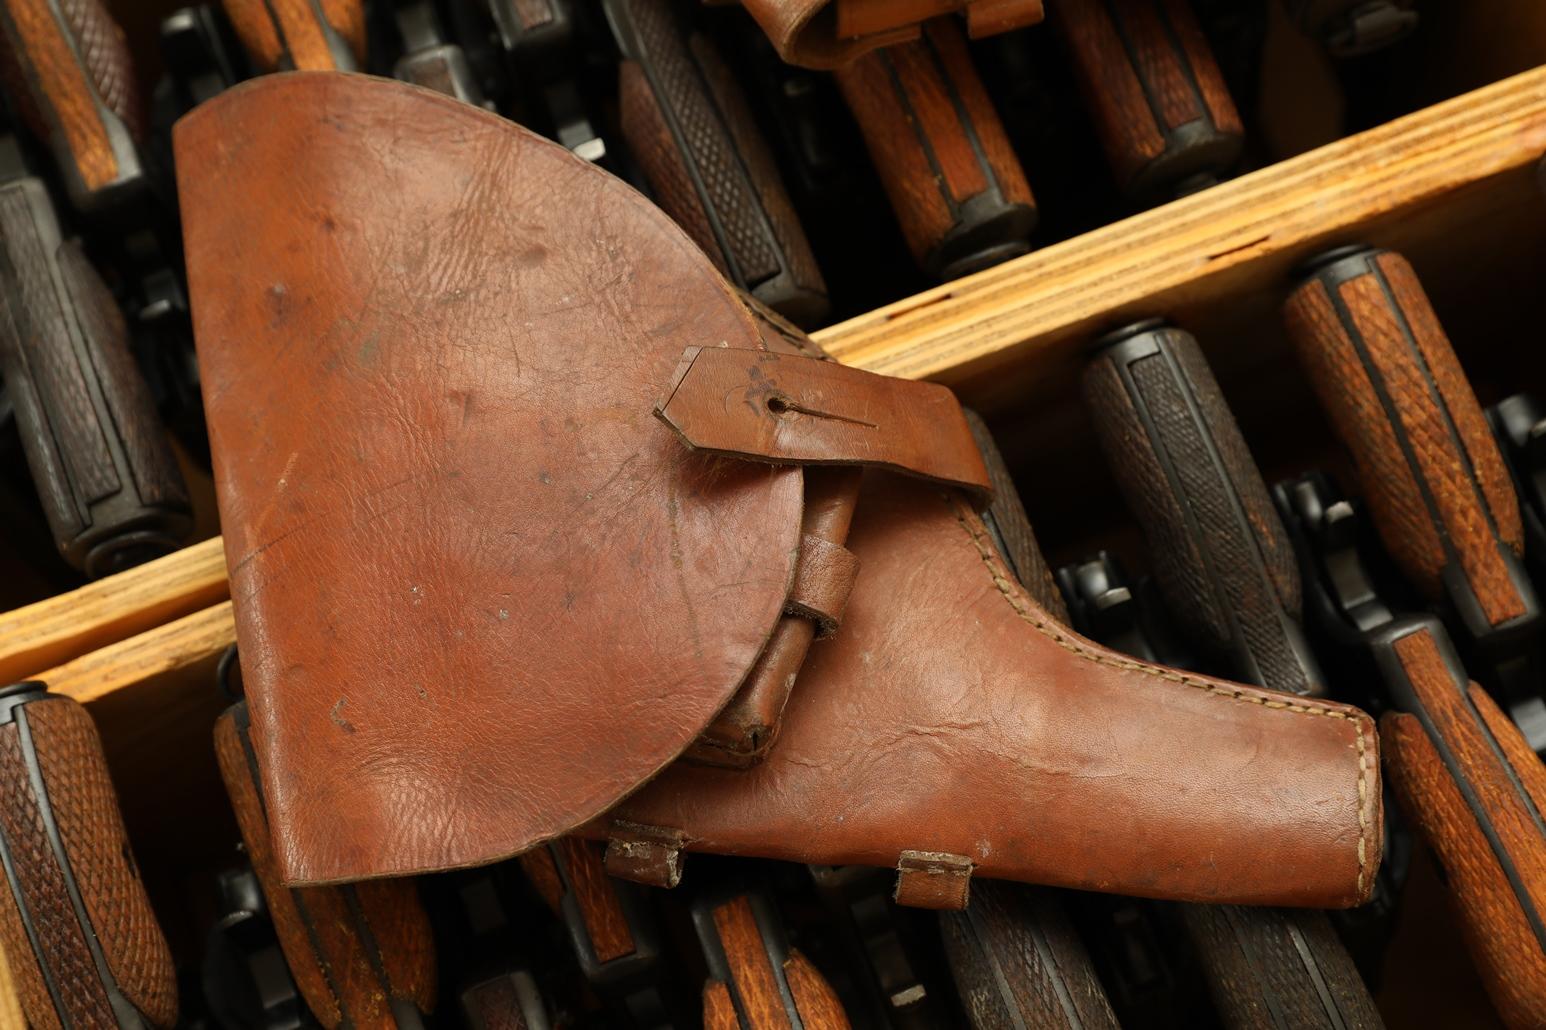 Фото Царская кобура для револьвера Наган, 1914 год, склад